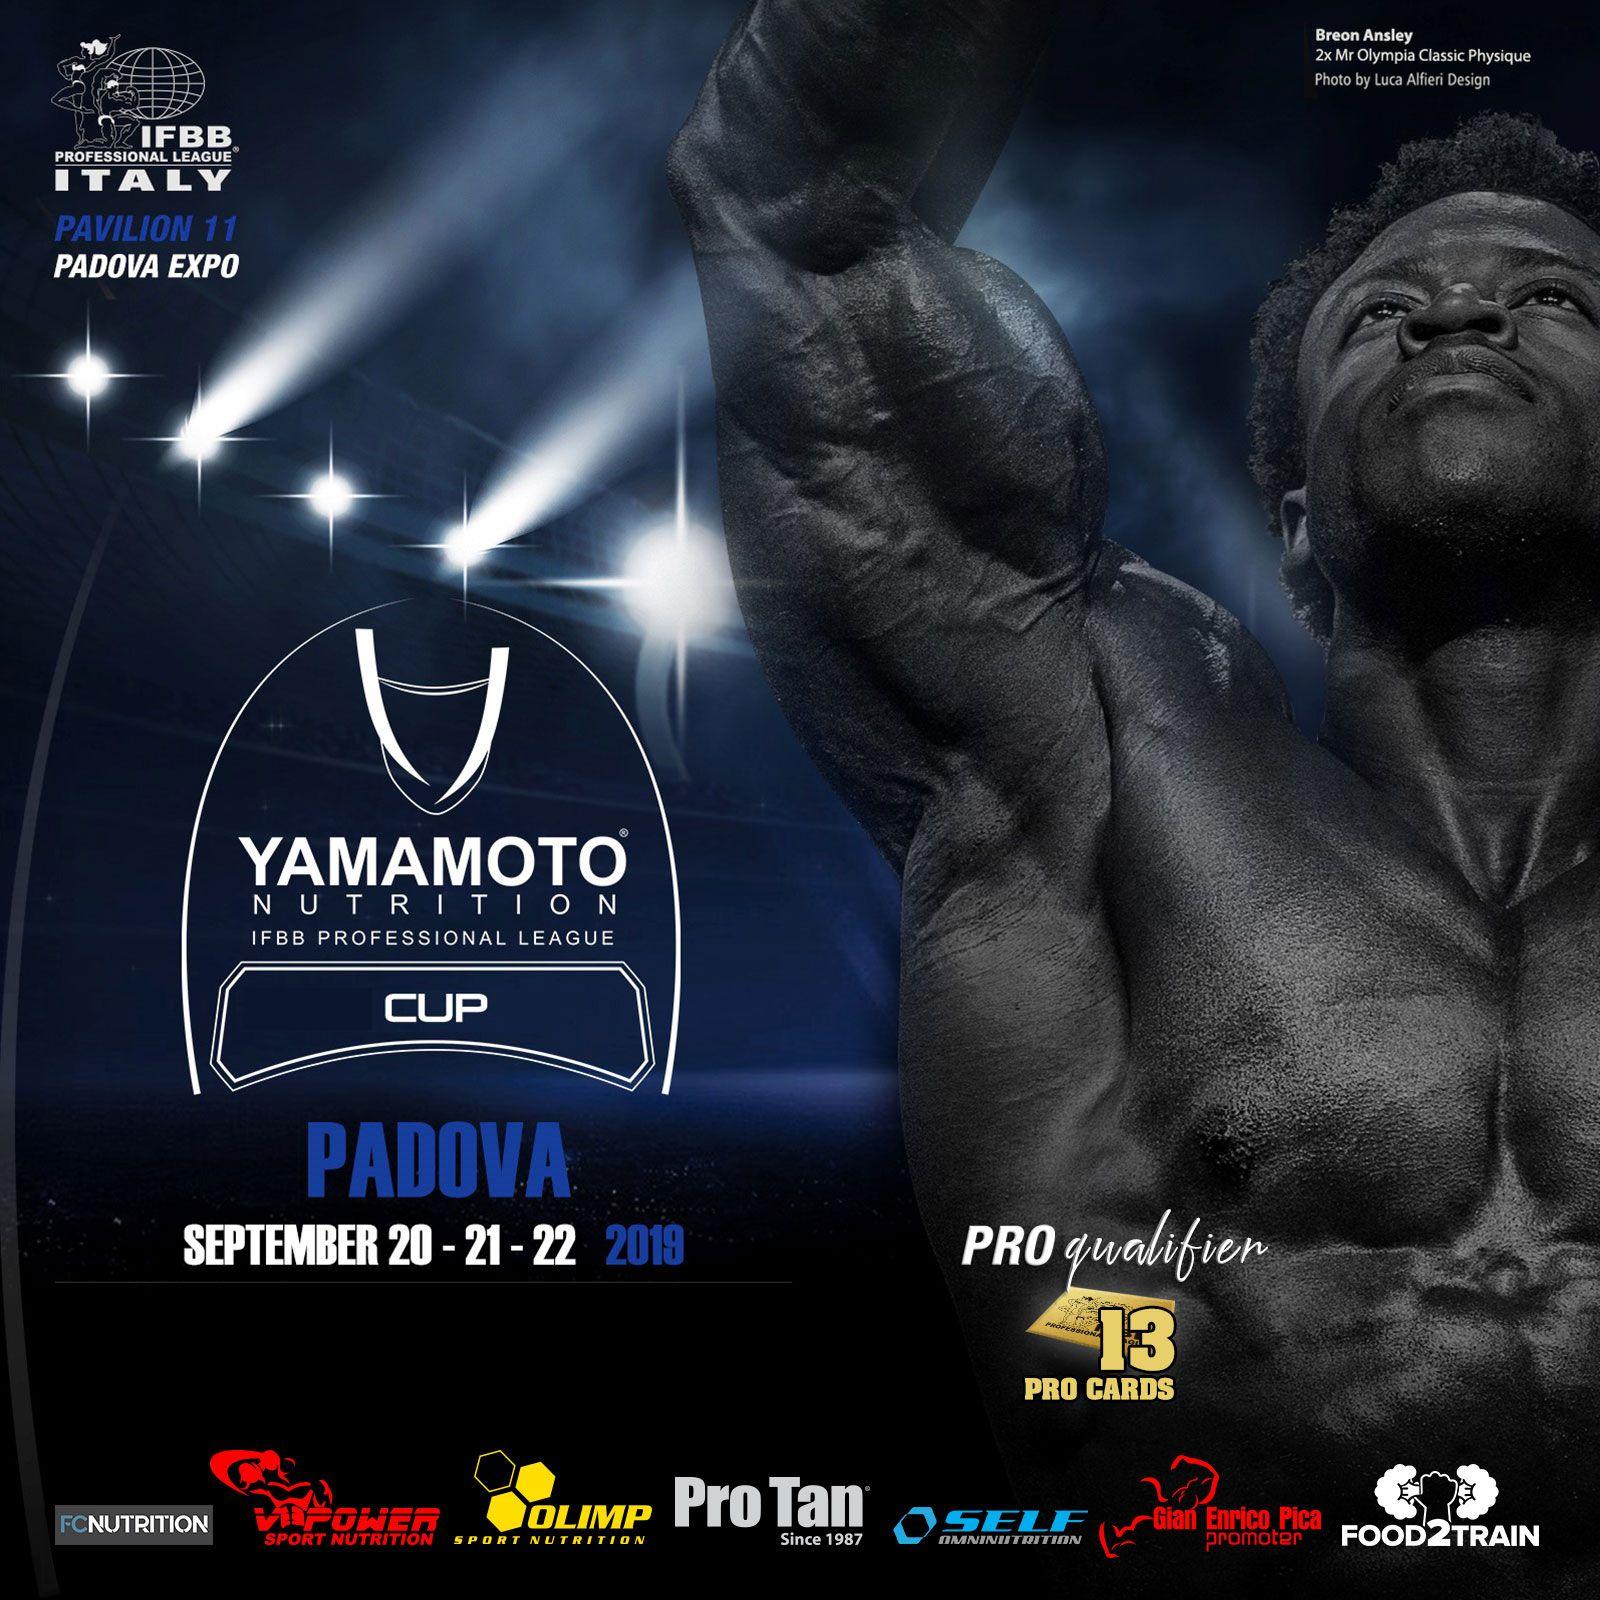 YAMAMOTO-PRO-CUP-PADOVA-V2-PROQUALIFIER.jpg